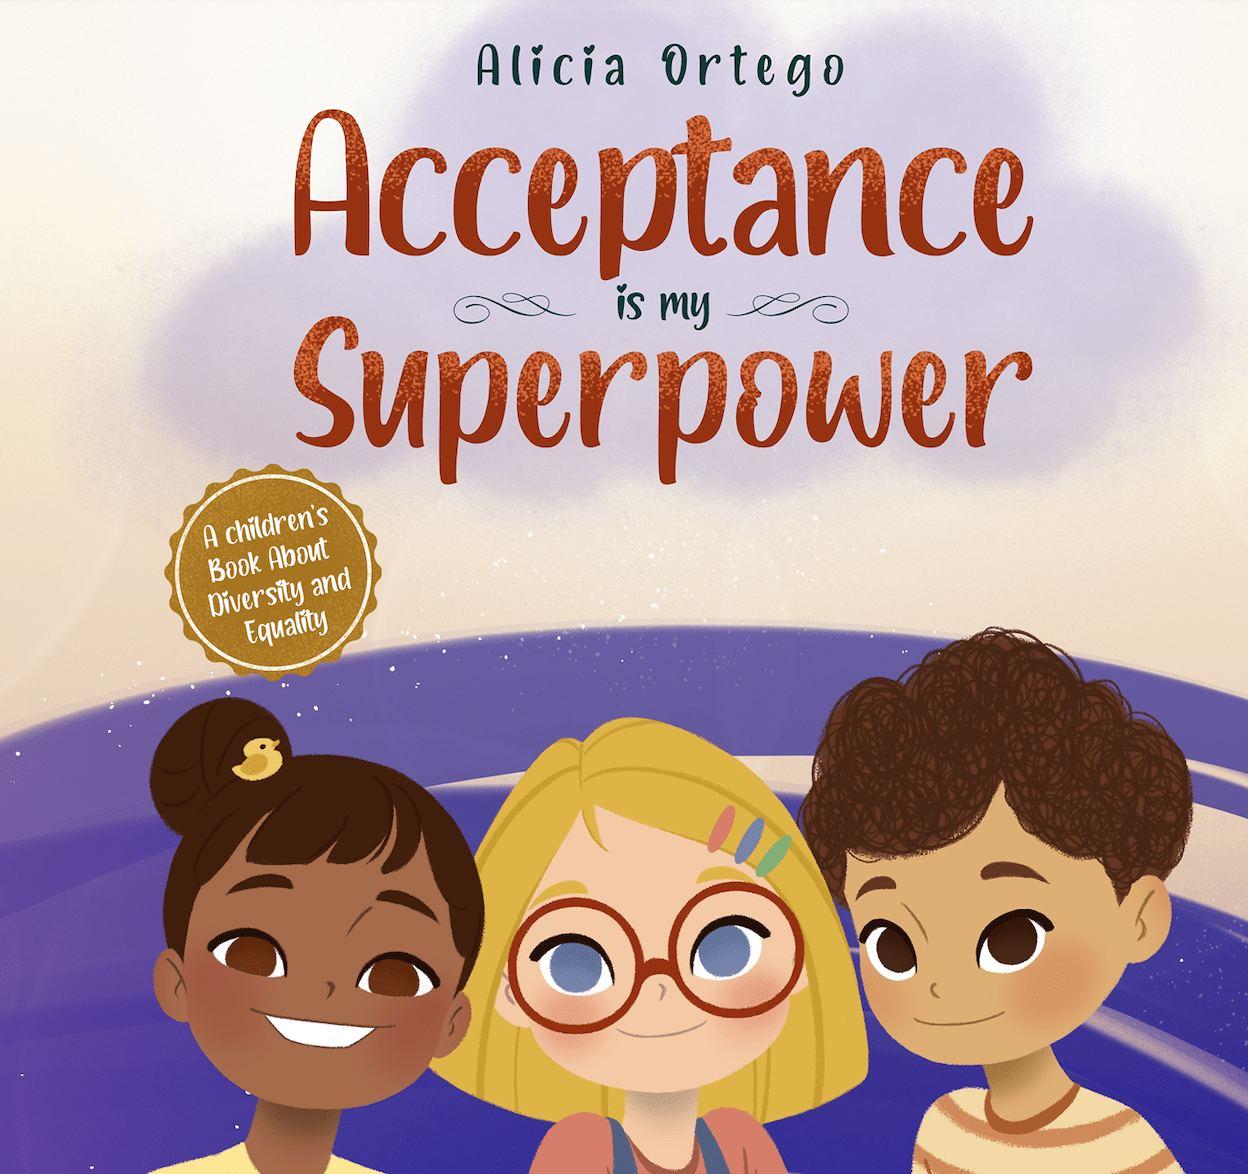 children's Book about Diversity